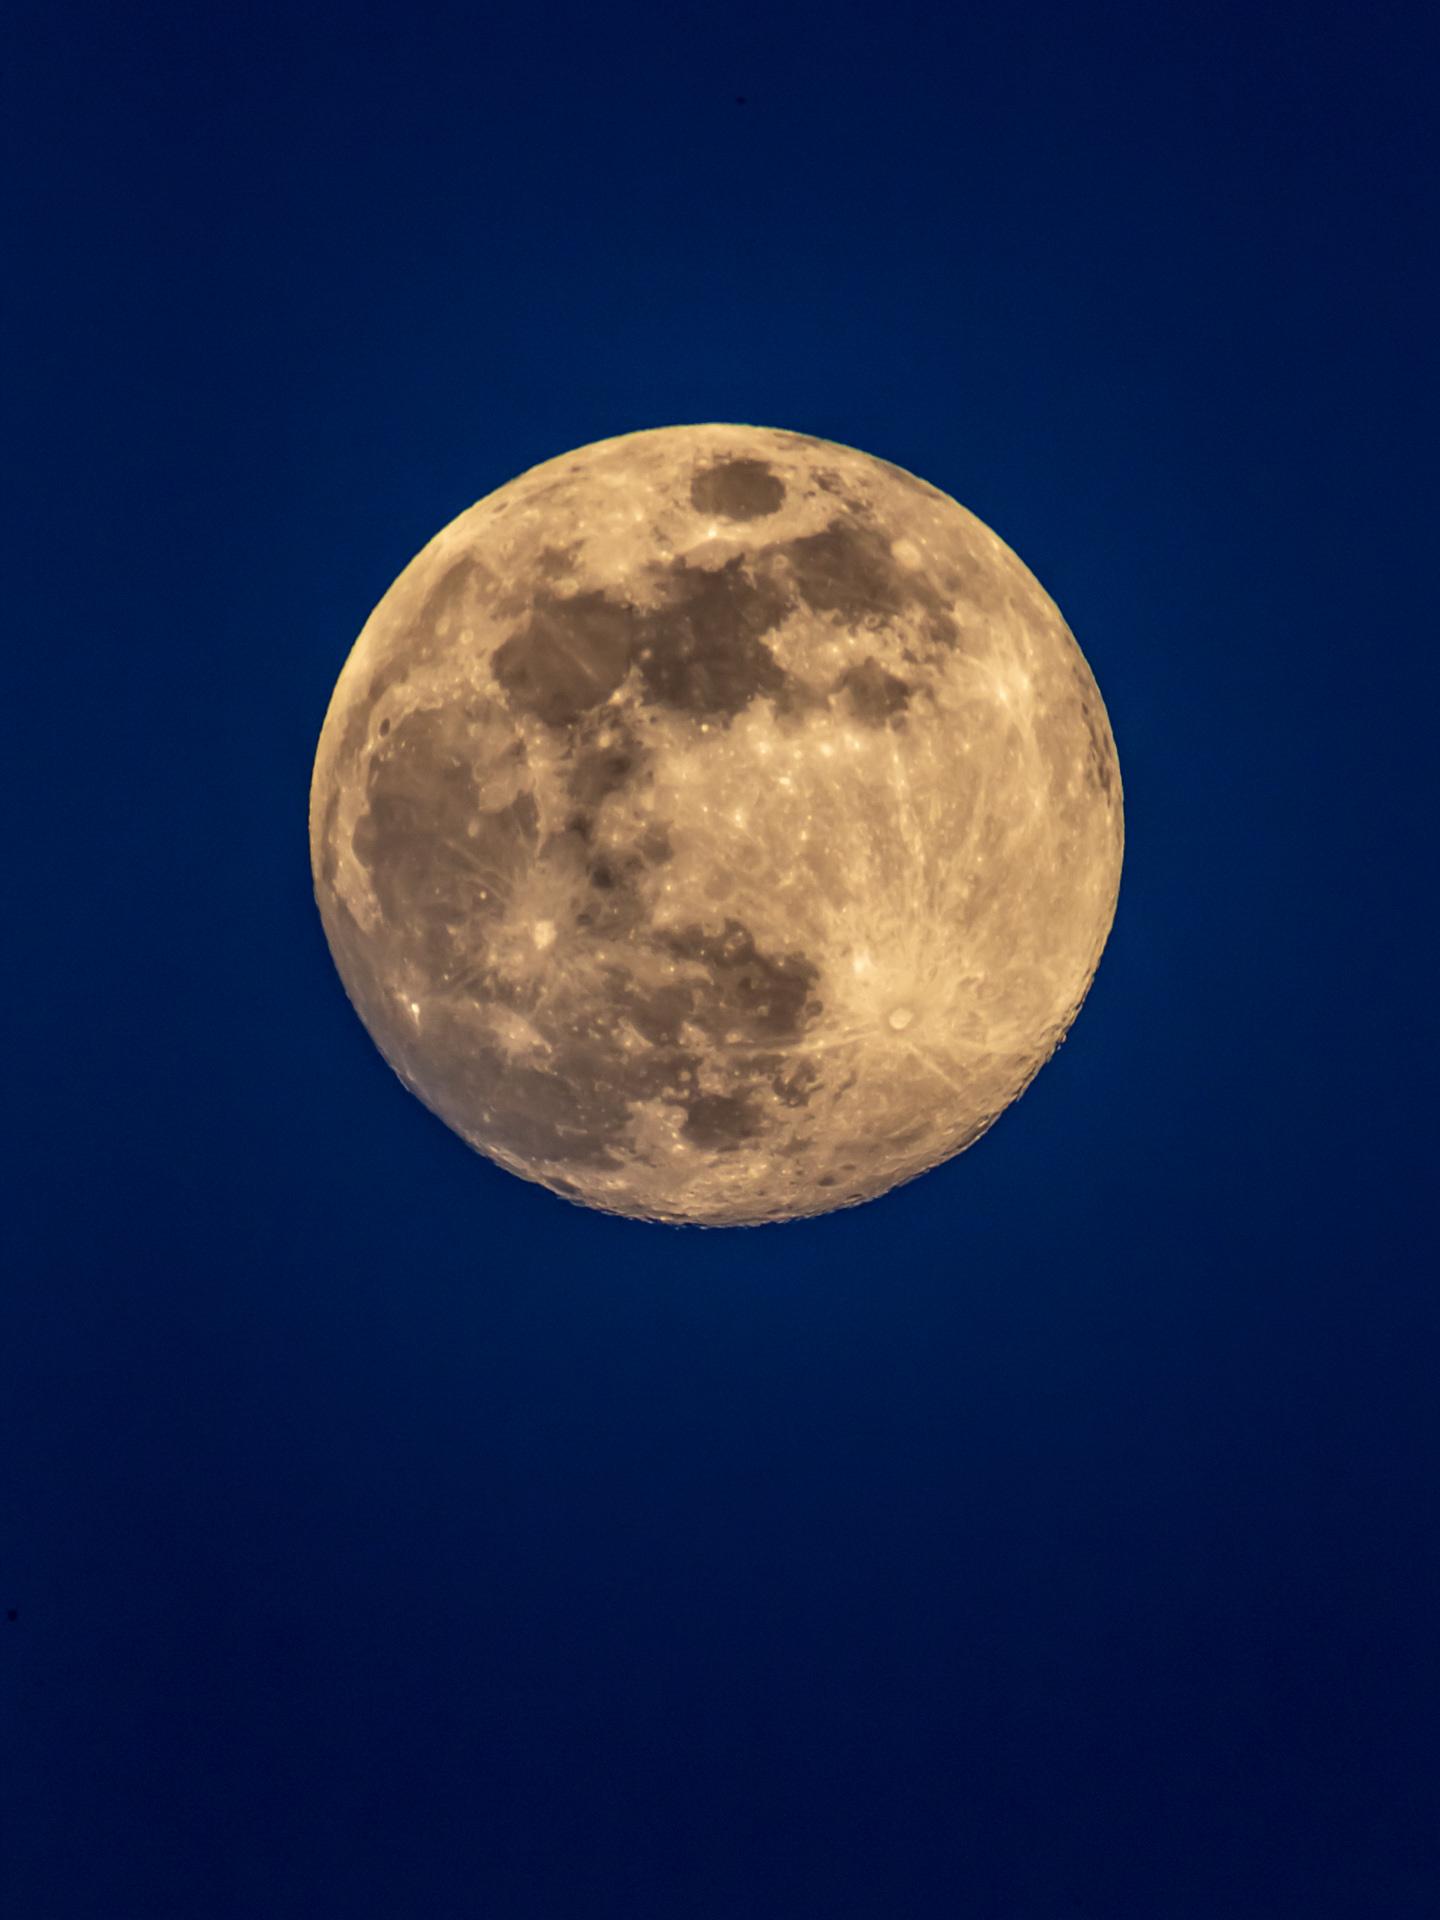 Full Moon | 20190517 2016 E:38.96x77.00@84m